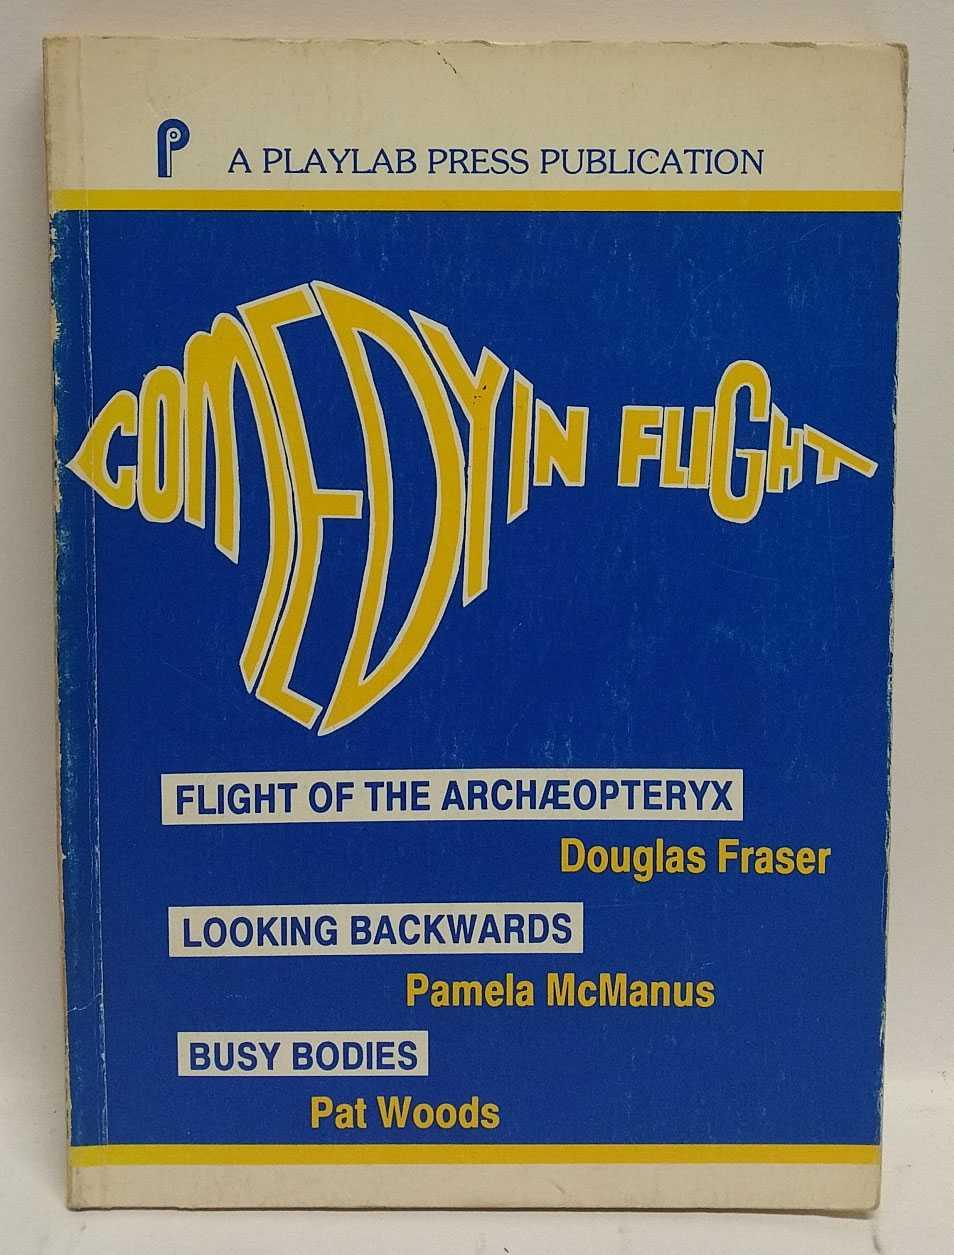 DOUGLAS FRASER; PAMELA MCMANUS; PAT WOODS - Comedy In Flight